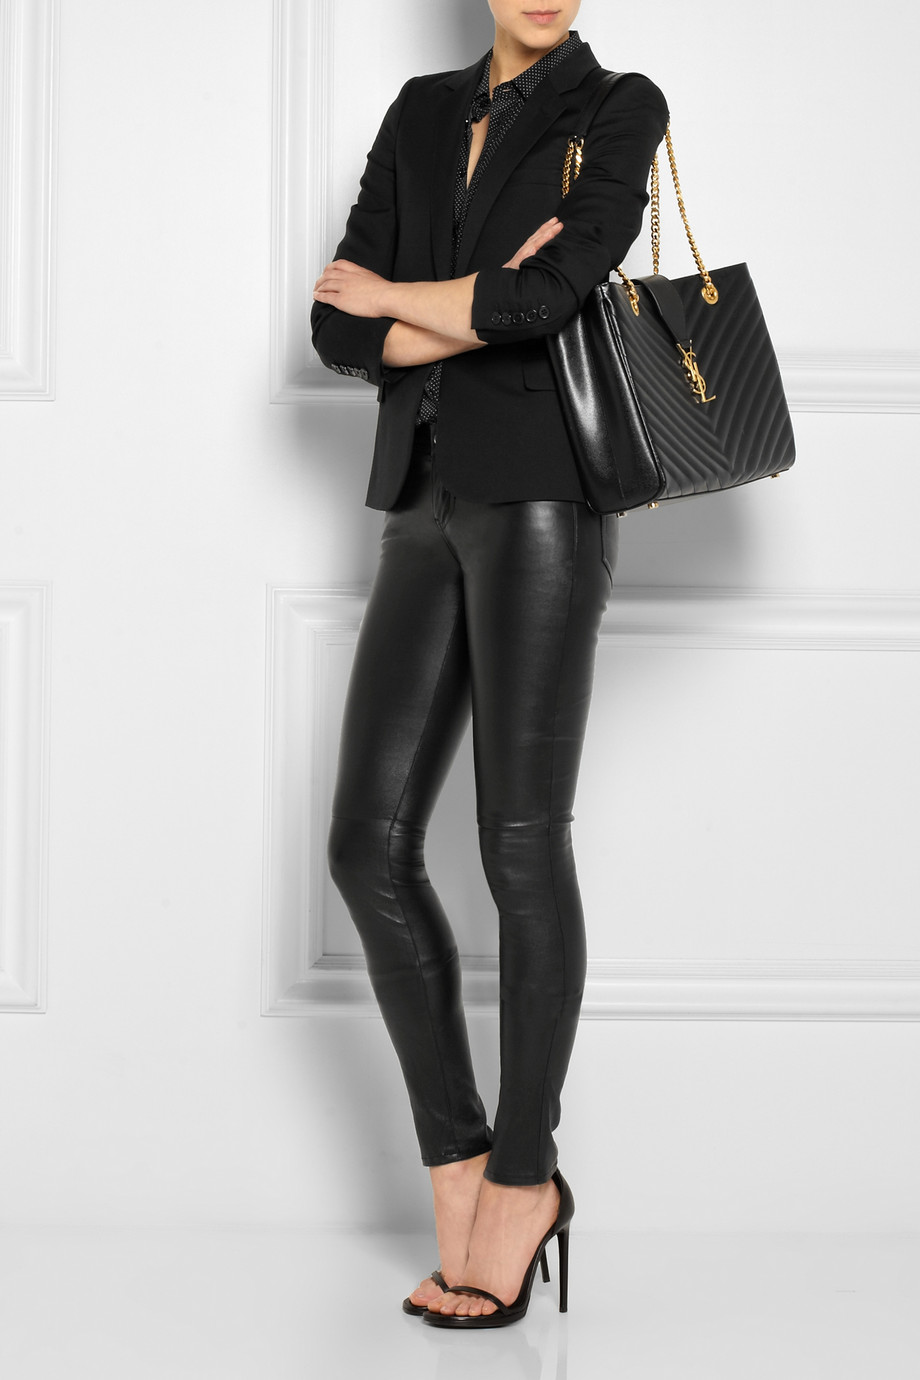 ysl leather bag